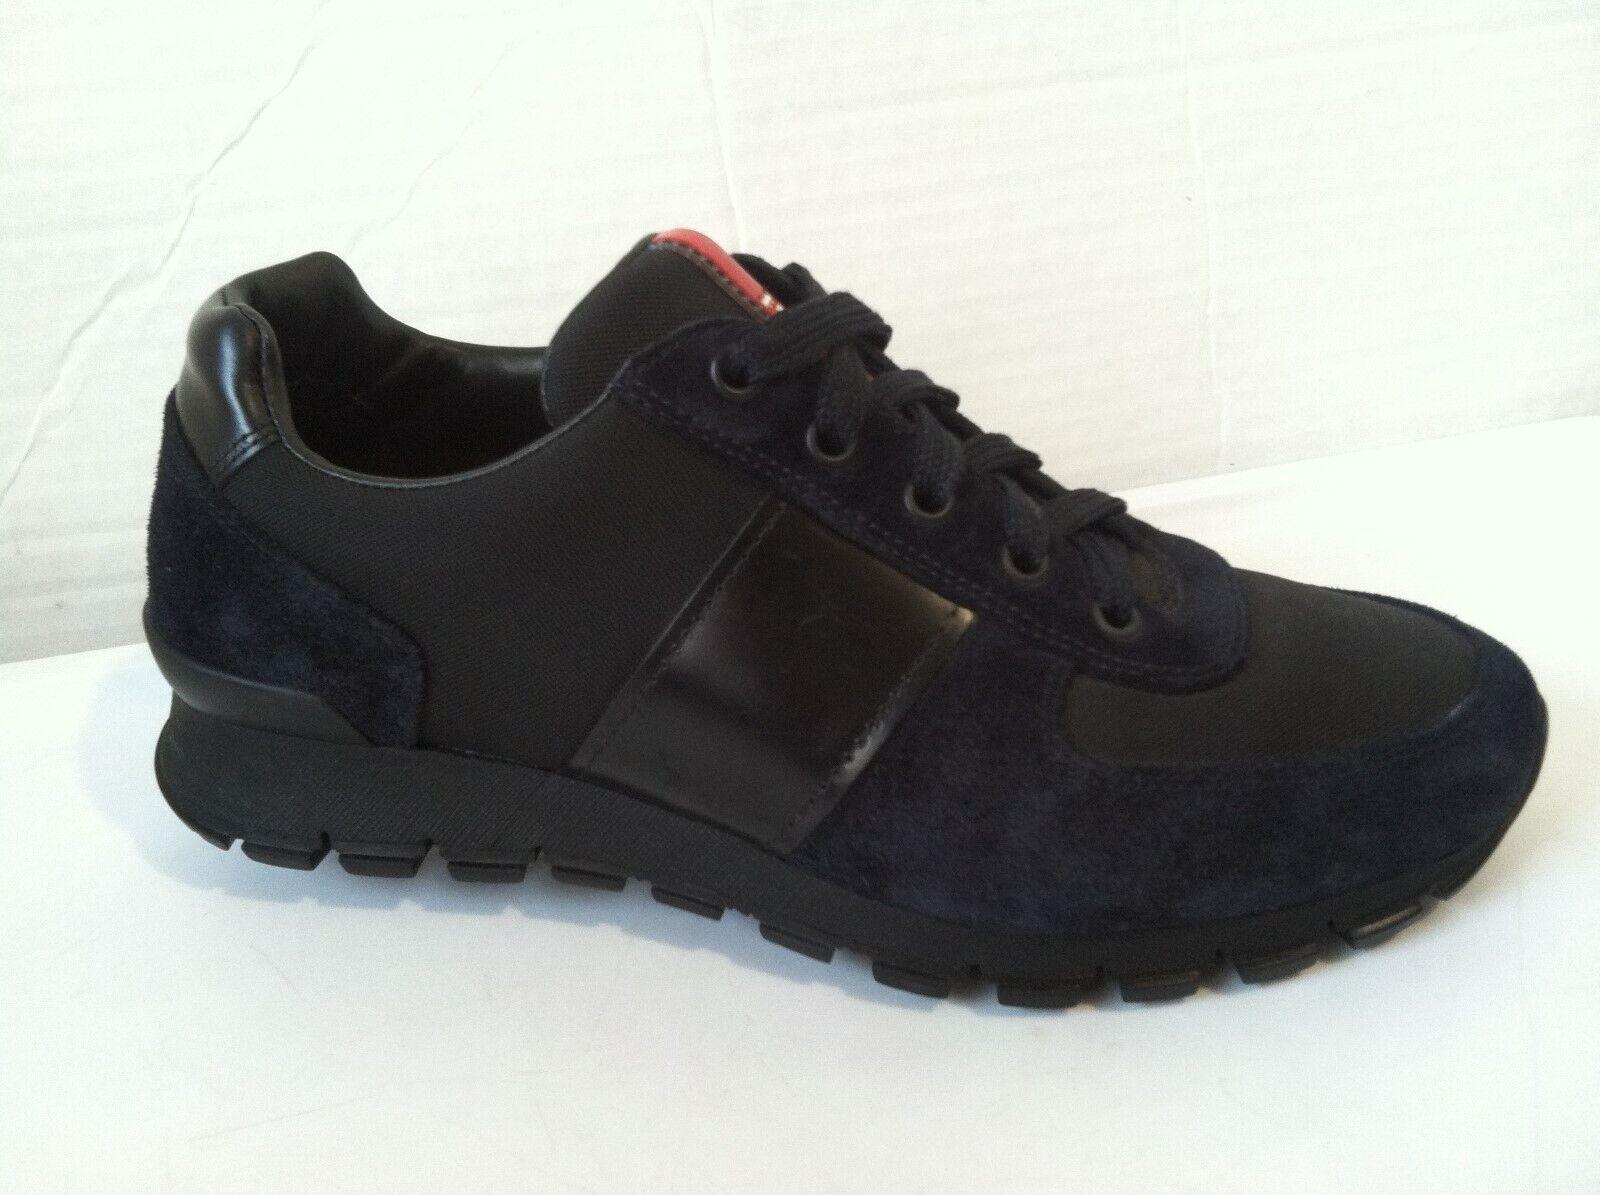 shoes PRADA,  4E2718, ASFALTO black NUOVE, BLACK SNEAKERS  MENS SIZE 6 MINT